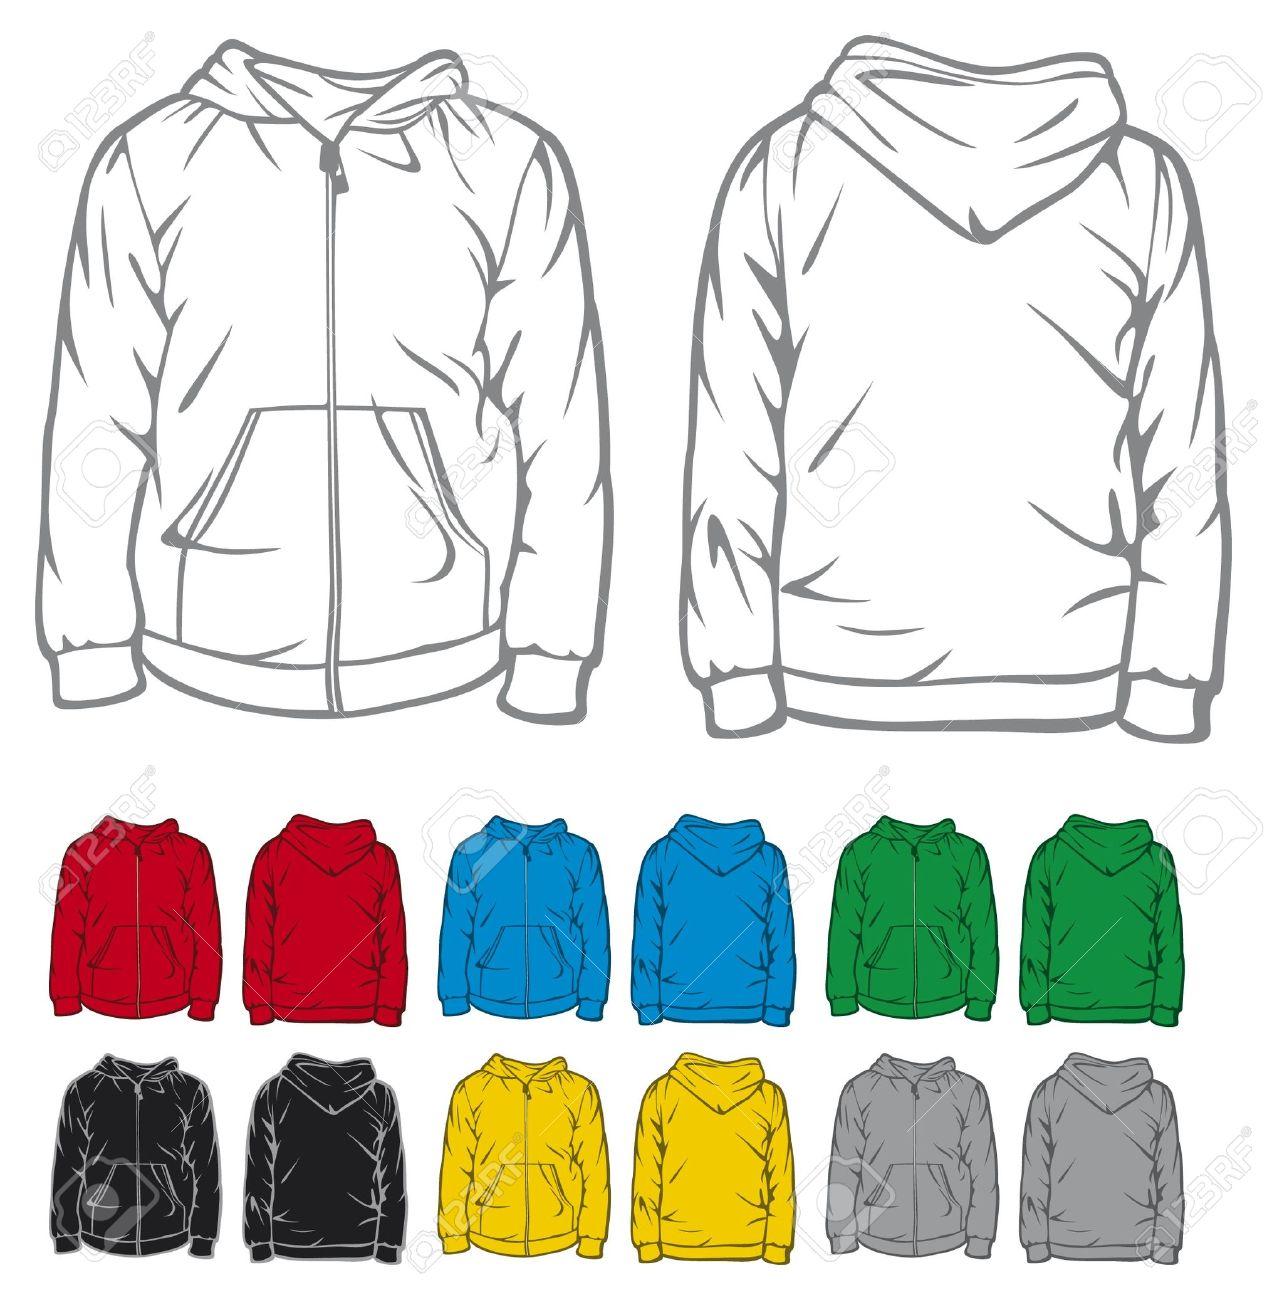 Men S Hooded Sweatshirt With Pocket Hooded